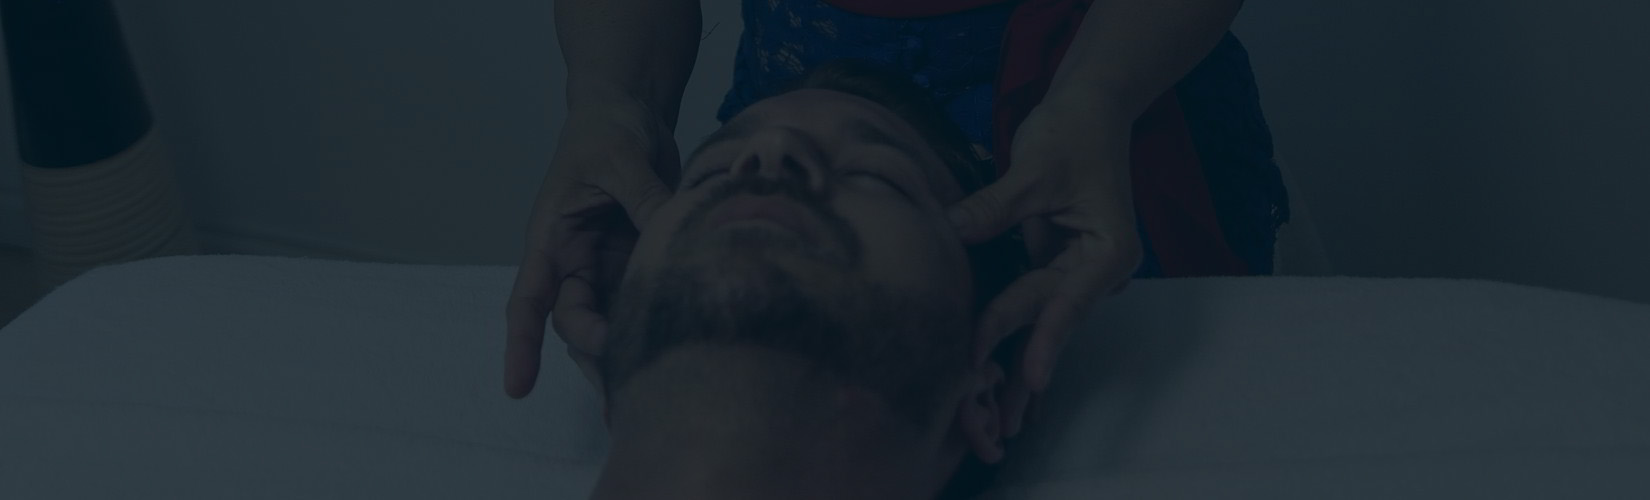 masaj capilar